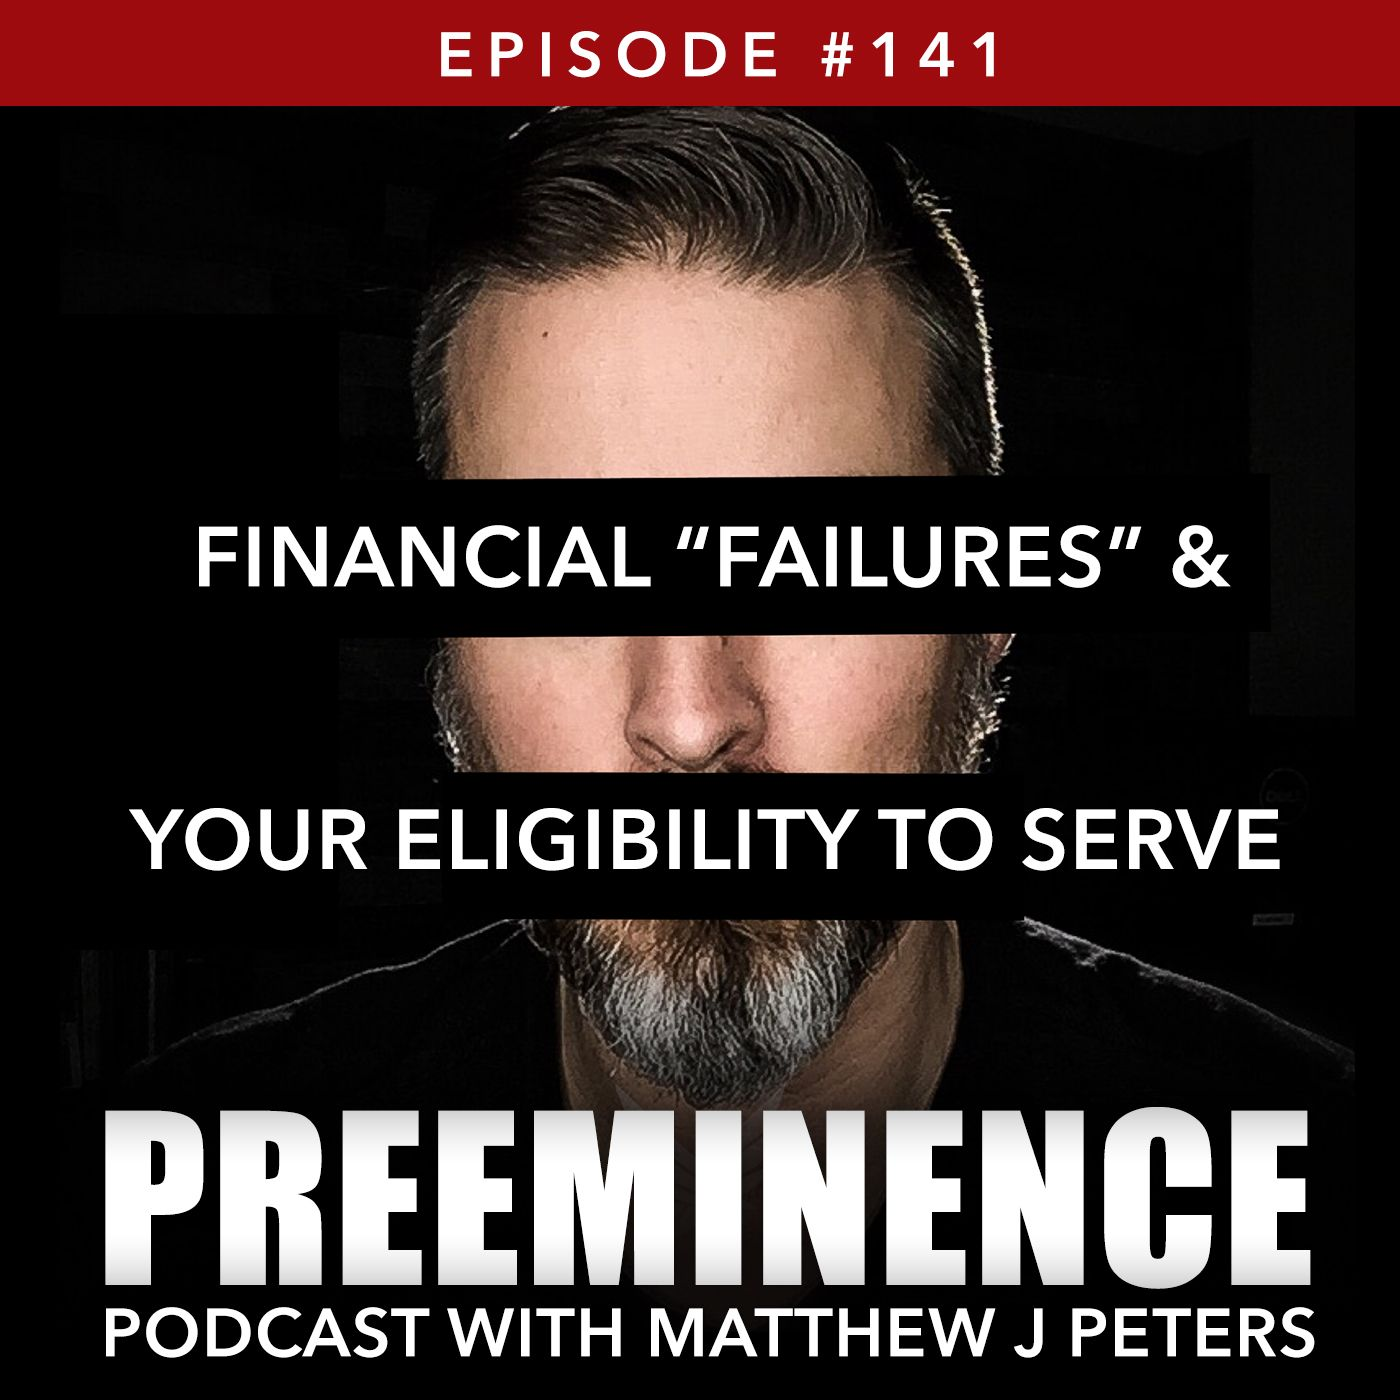 141 - Financial Failure & Your Eligibility to Serve